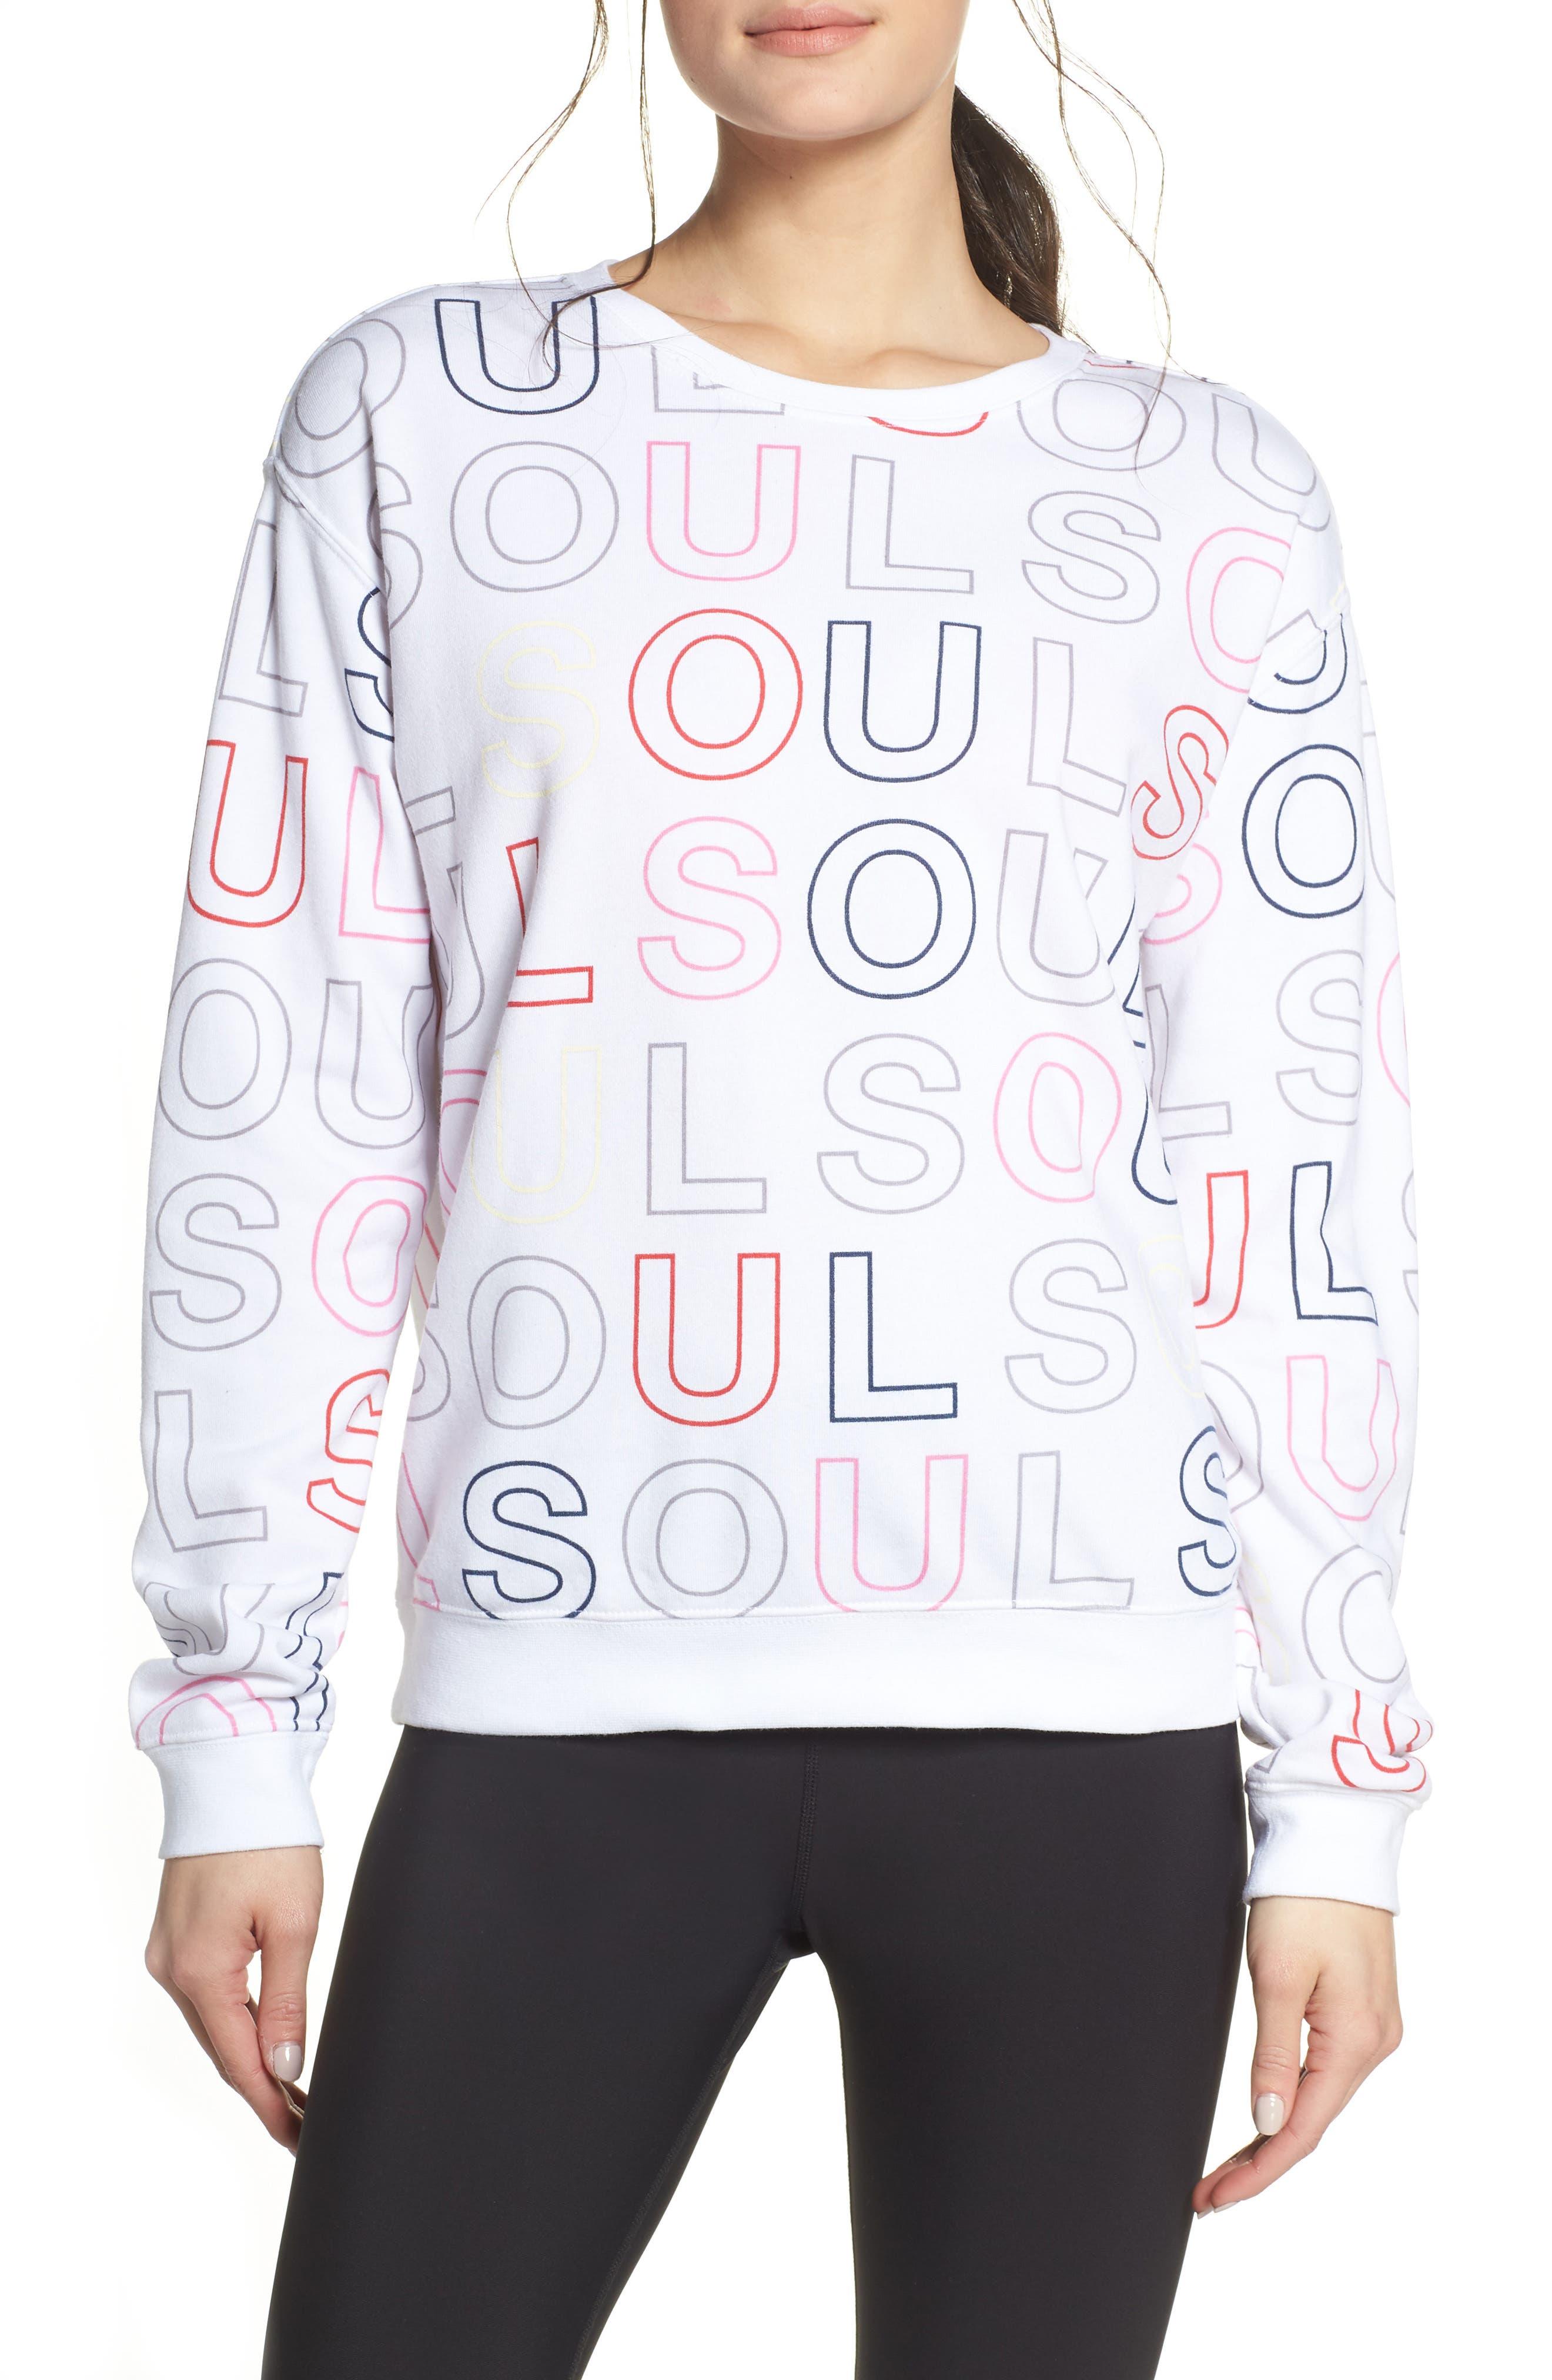 Soul By Soulcycle Knockout Print Sweatshirt, White